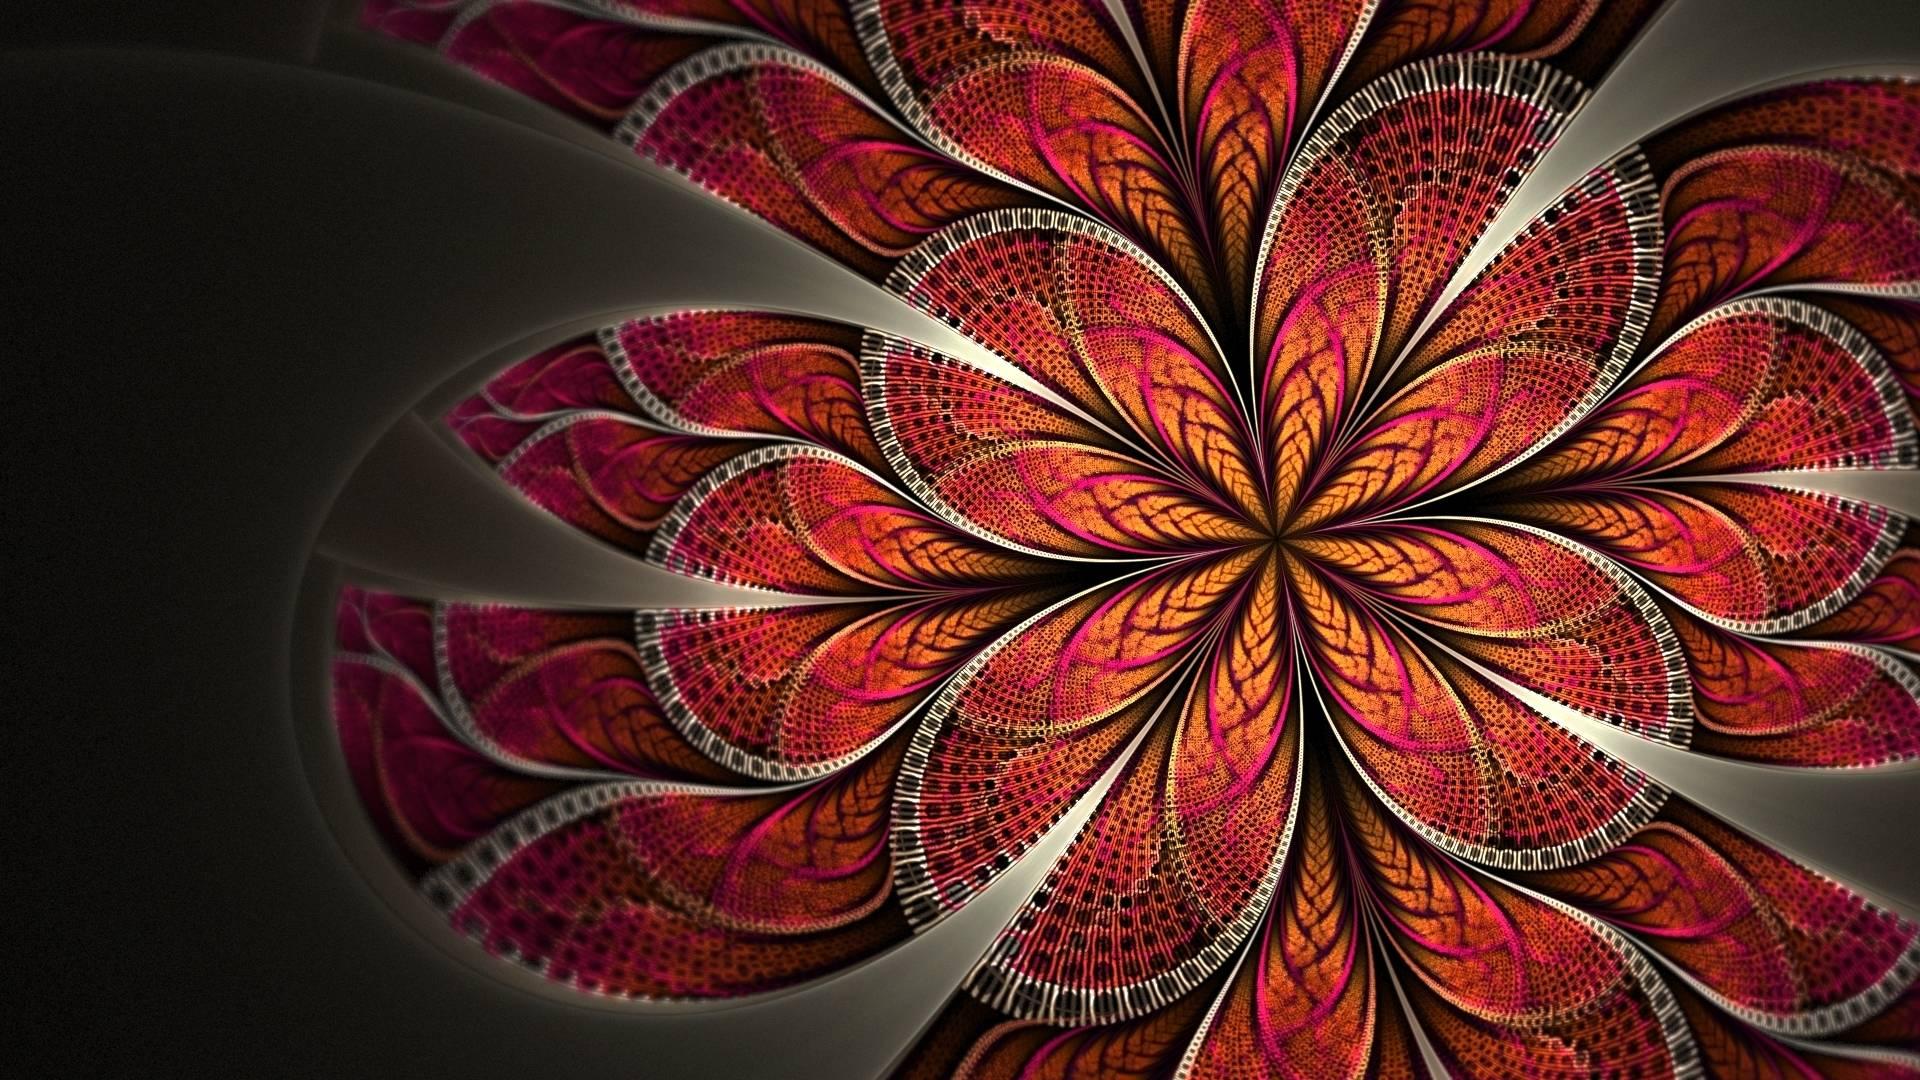 Hd Abstract Desktop Wallpapers Top Free Hd Abstract Desktop Backgrounds Wallpaperaccess